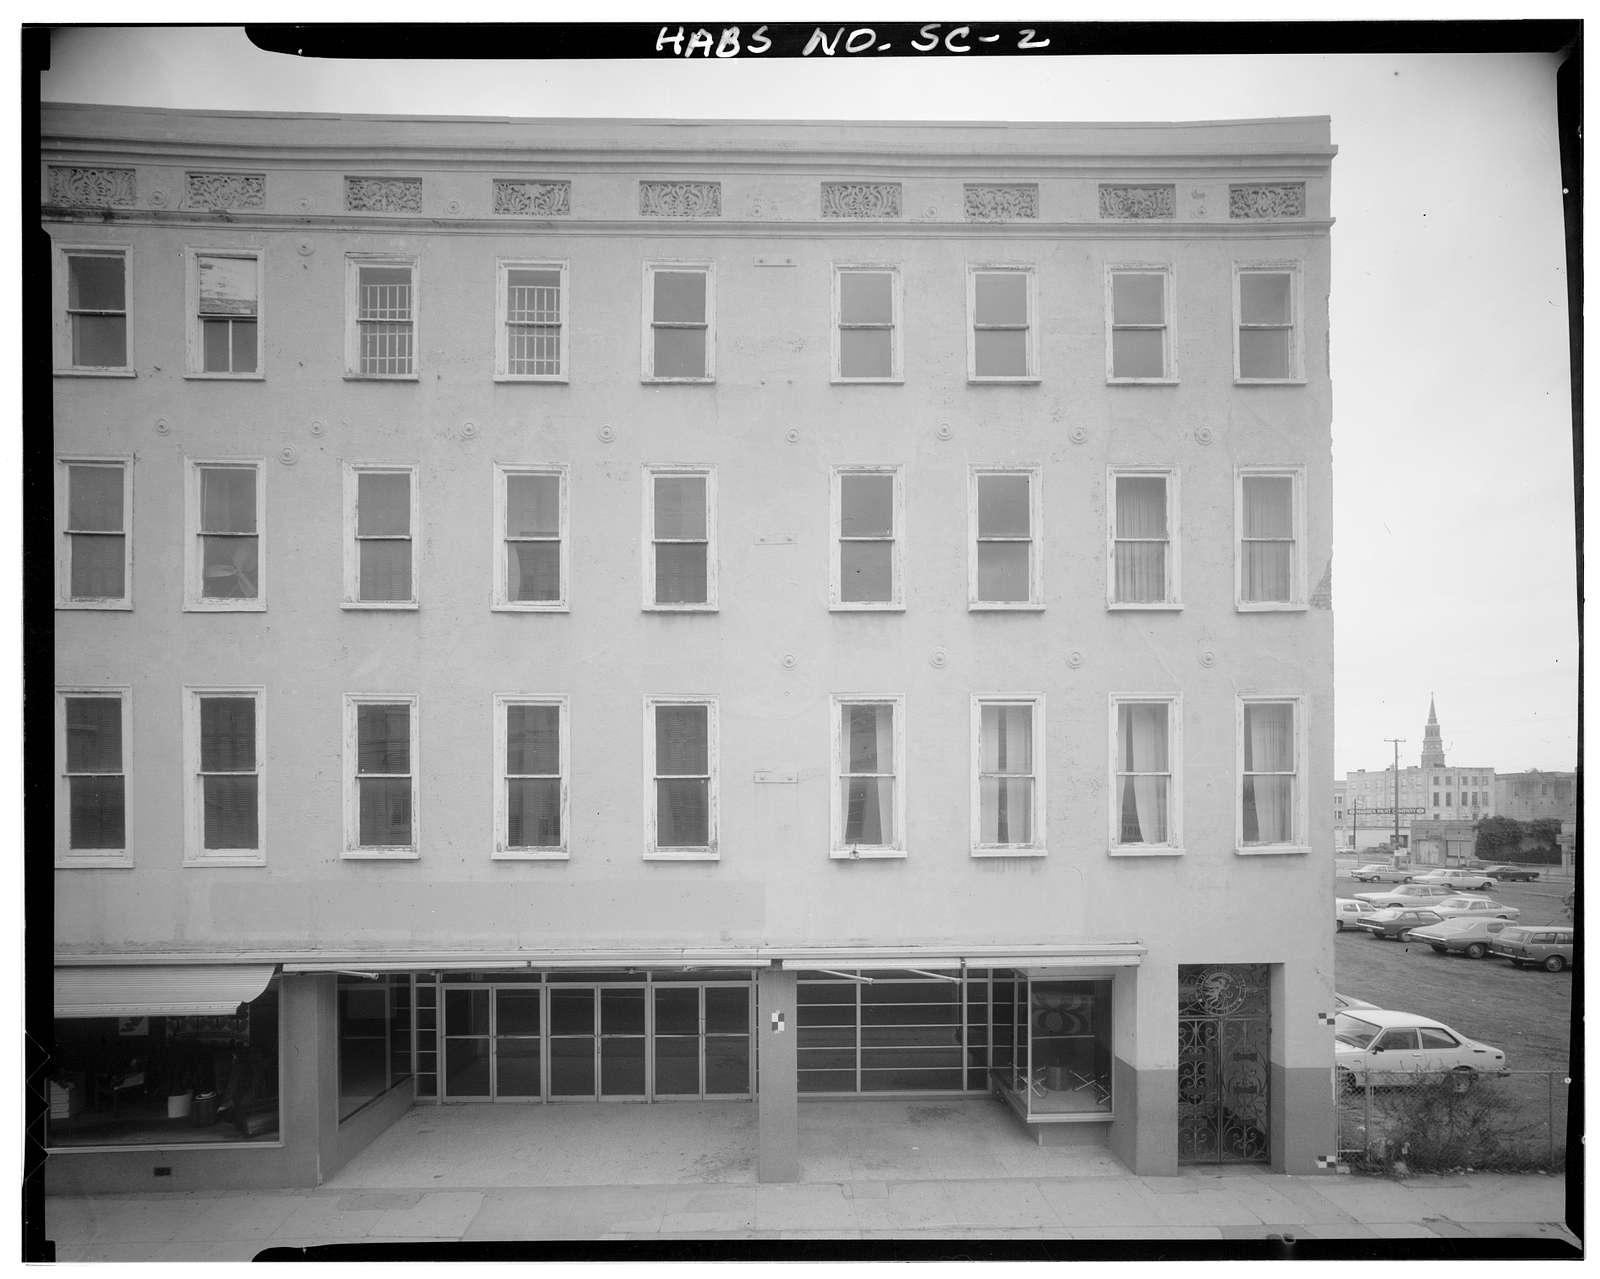 238-242 King Street (Commercial Building), Charleston, Charleston County, SC